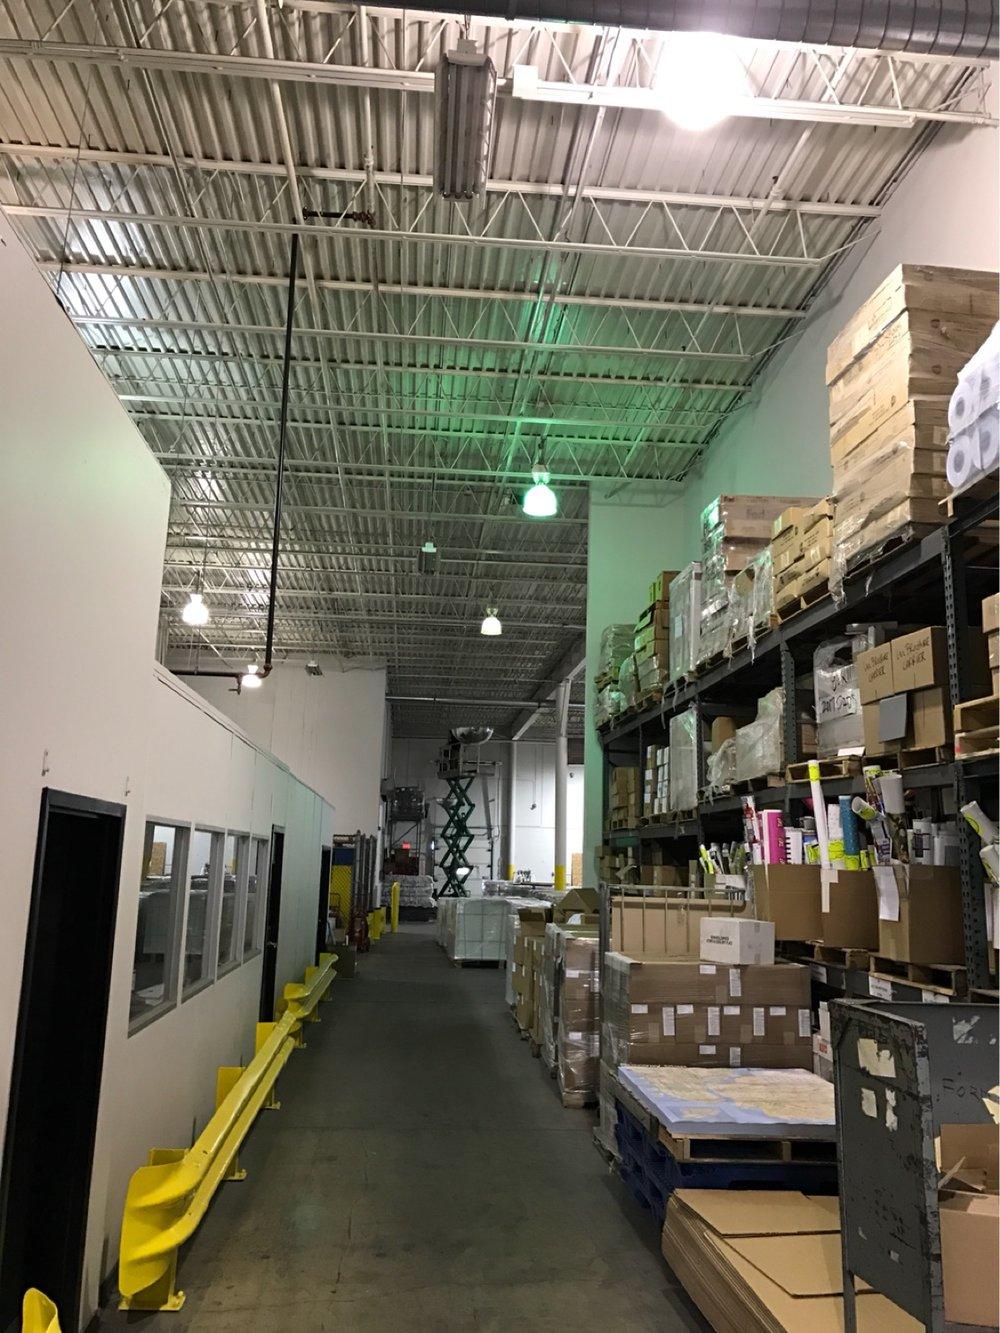 Unimac Graphics LED Lighting Retrofit - Albright Energy Solutions - Albright Electric - Mahwah NJ (7).jpeg